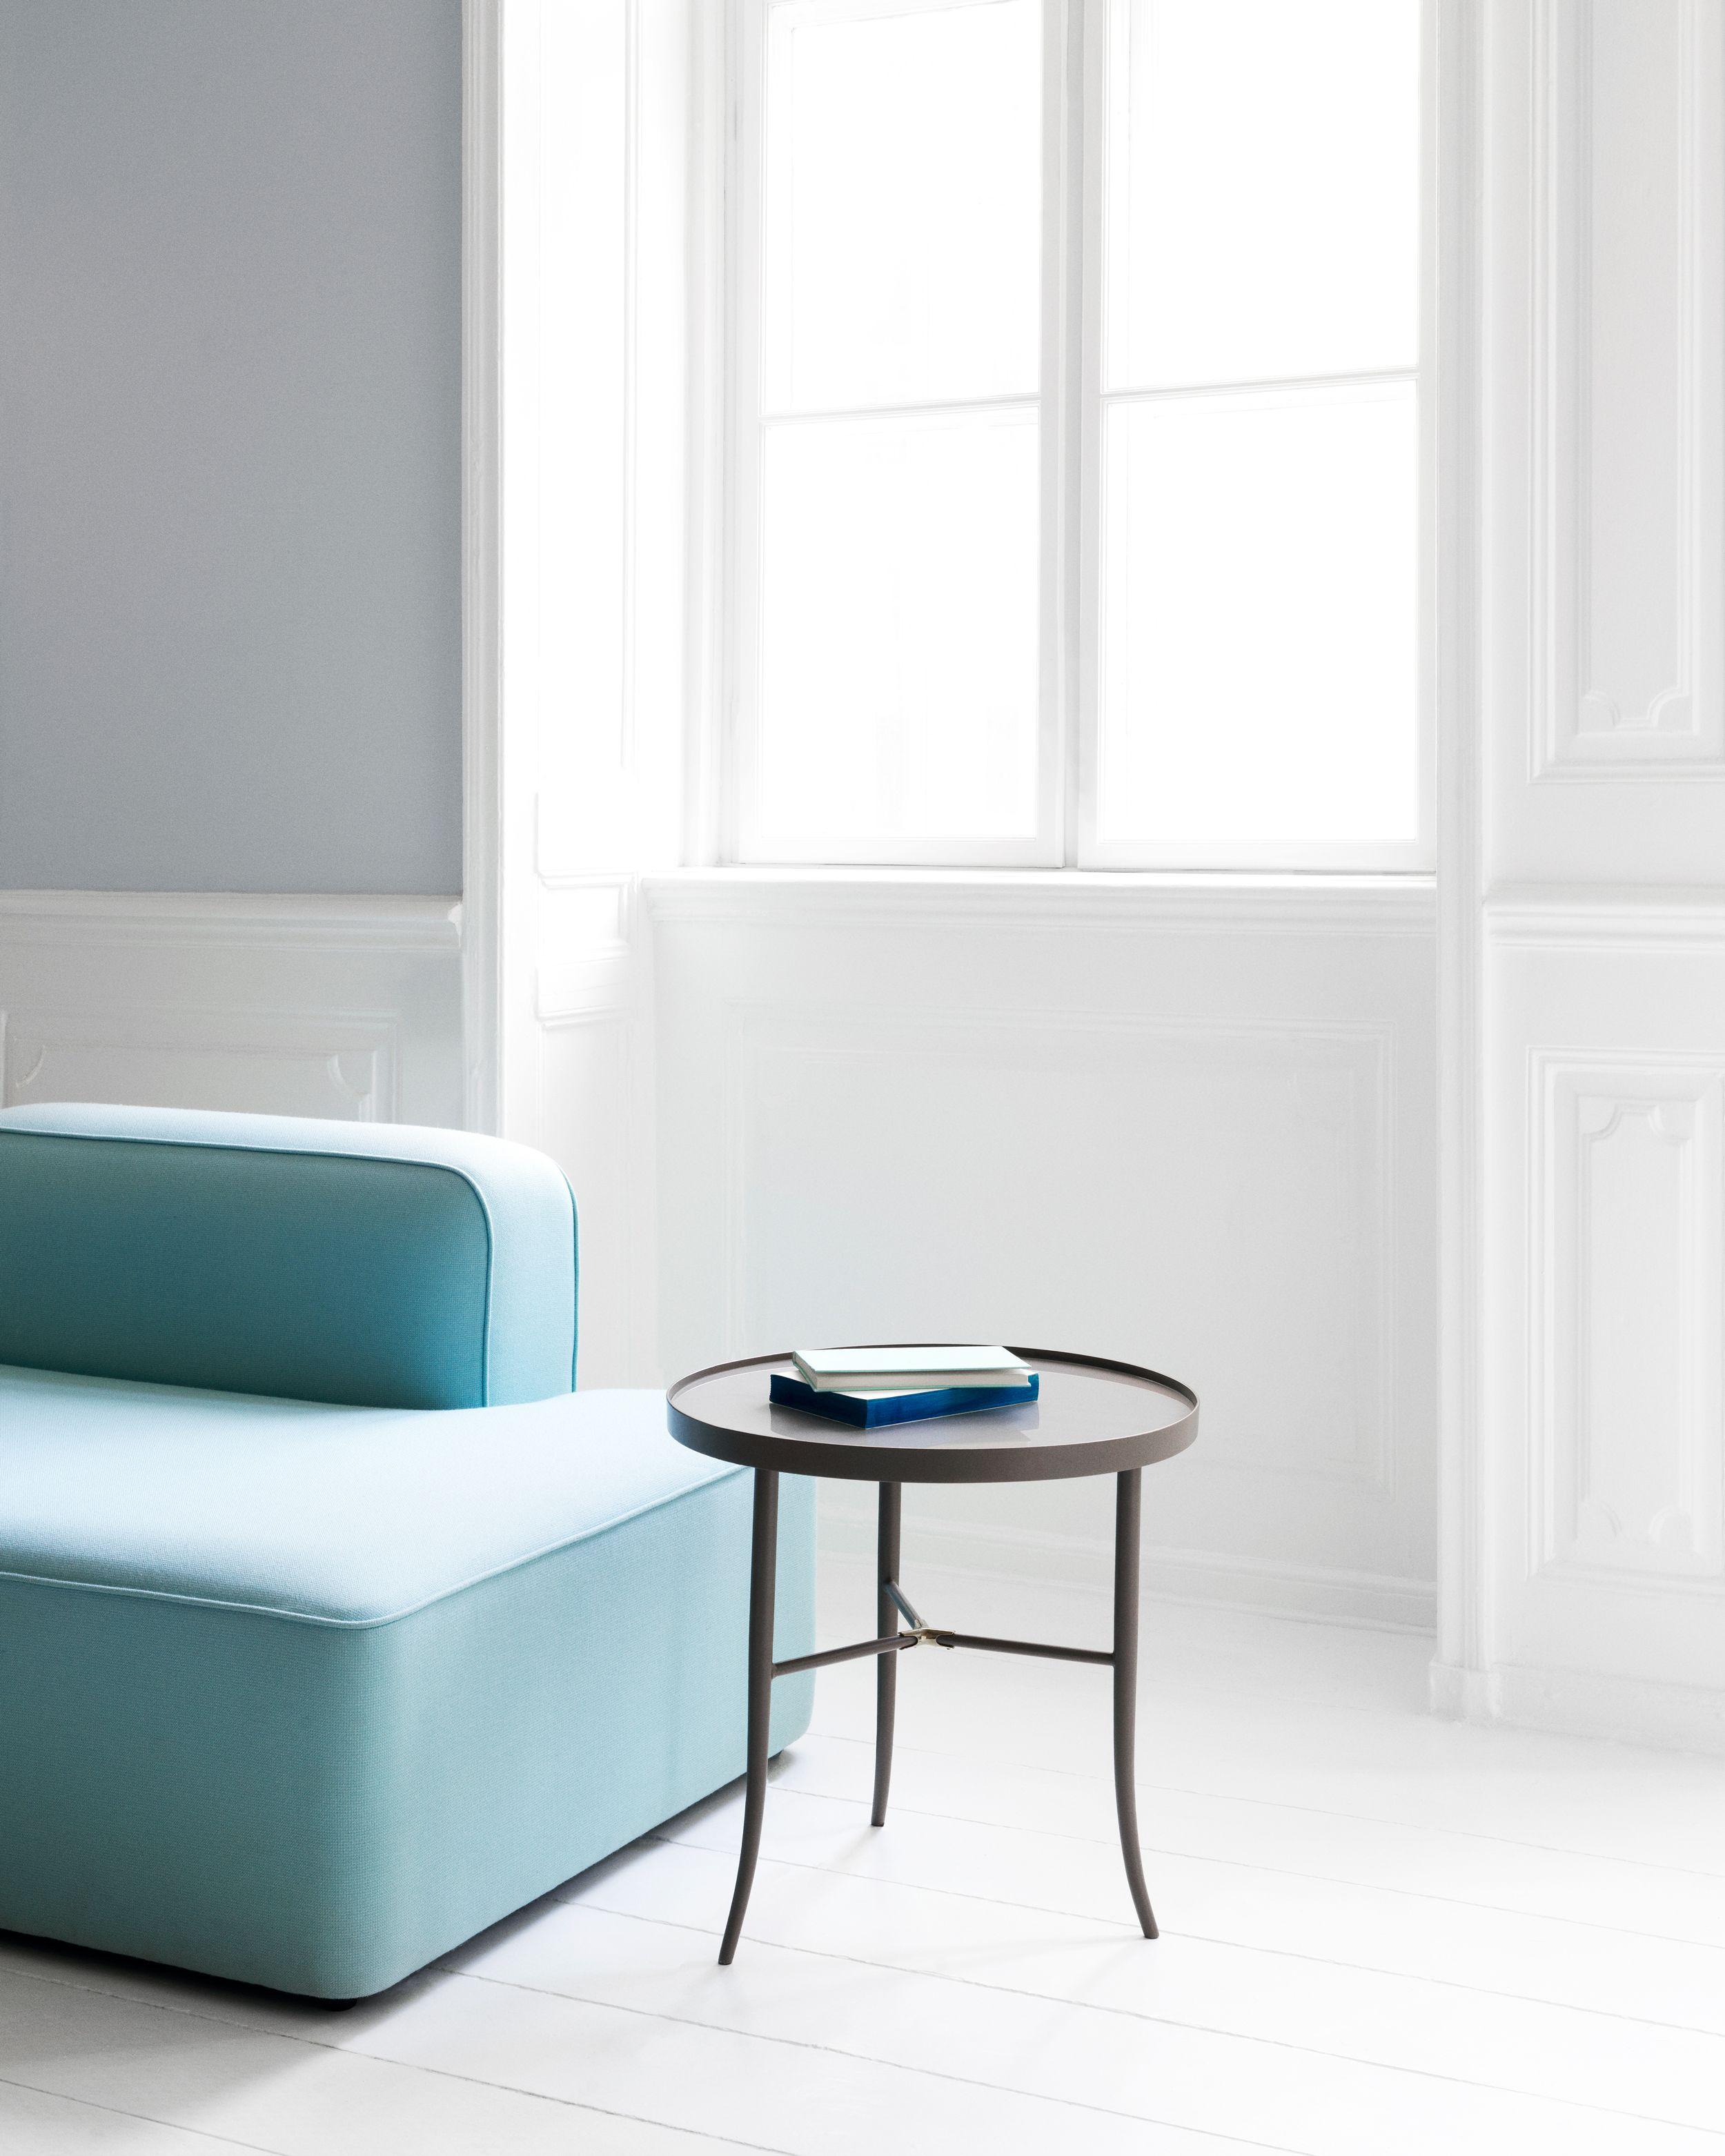 Lug Table Scandinavian Furniture Design Table Coffee Table Design [ 3125 x 2500 Pixel ]